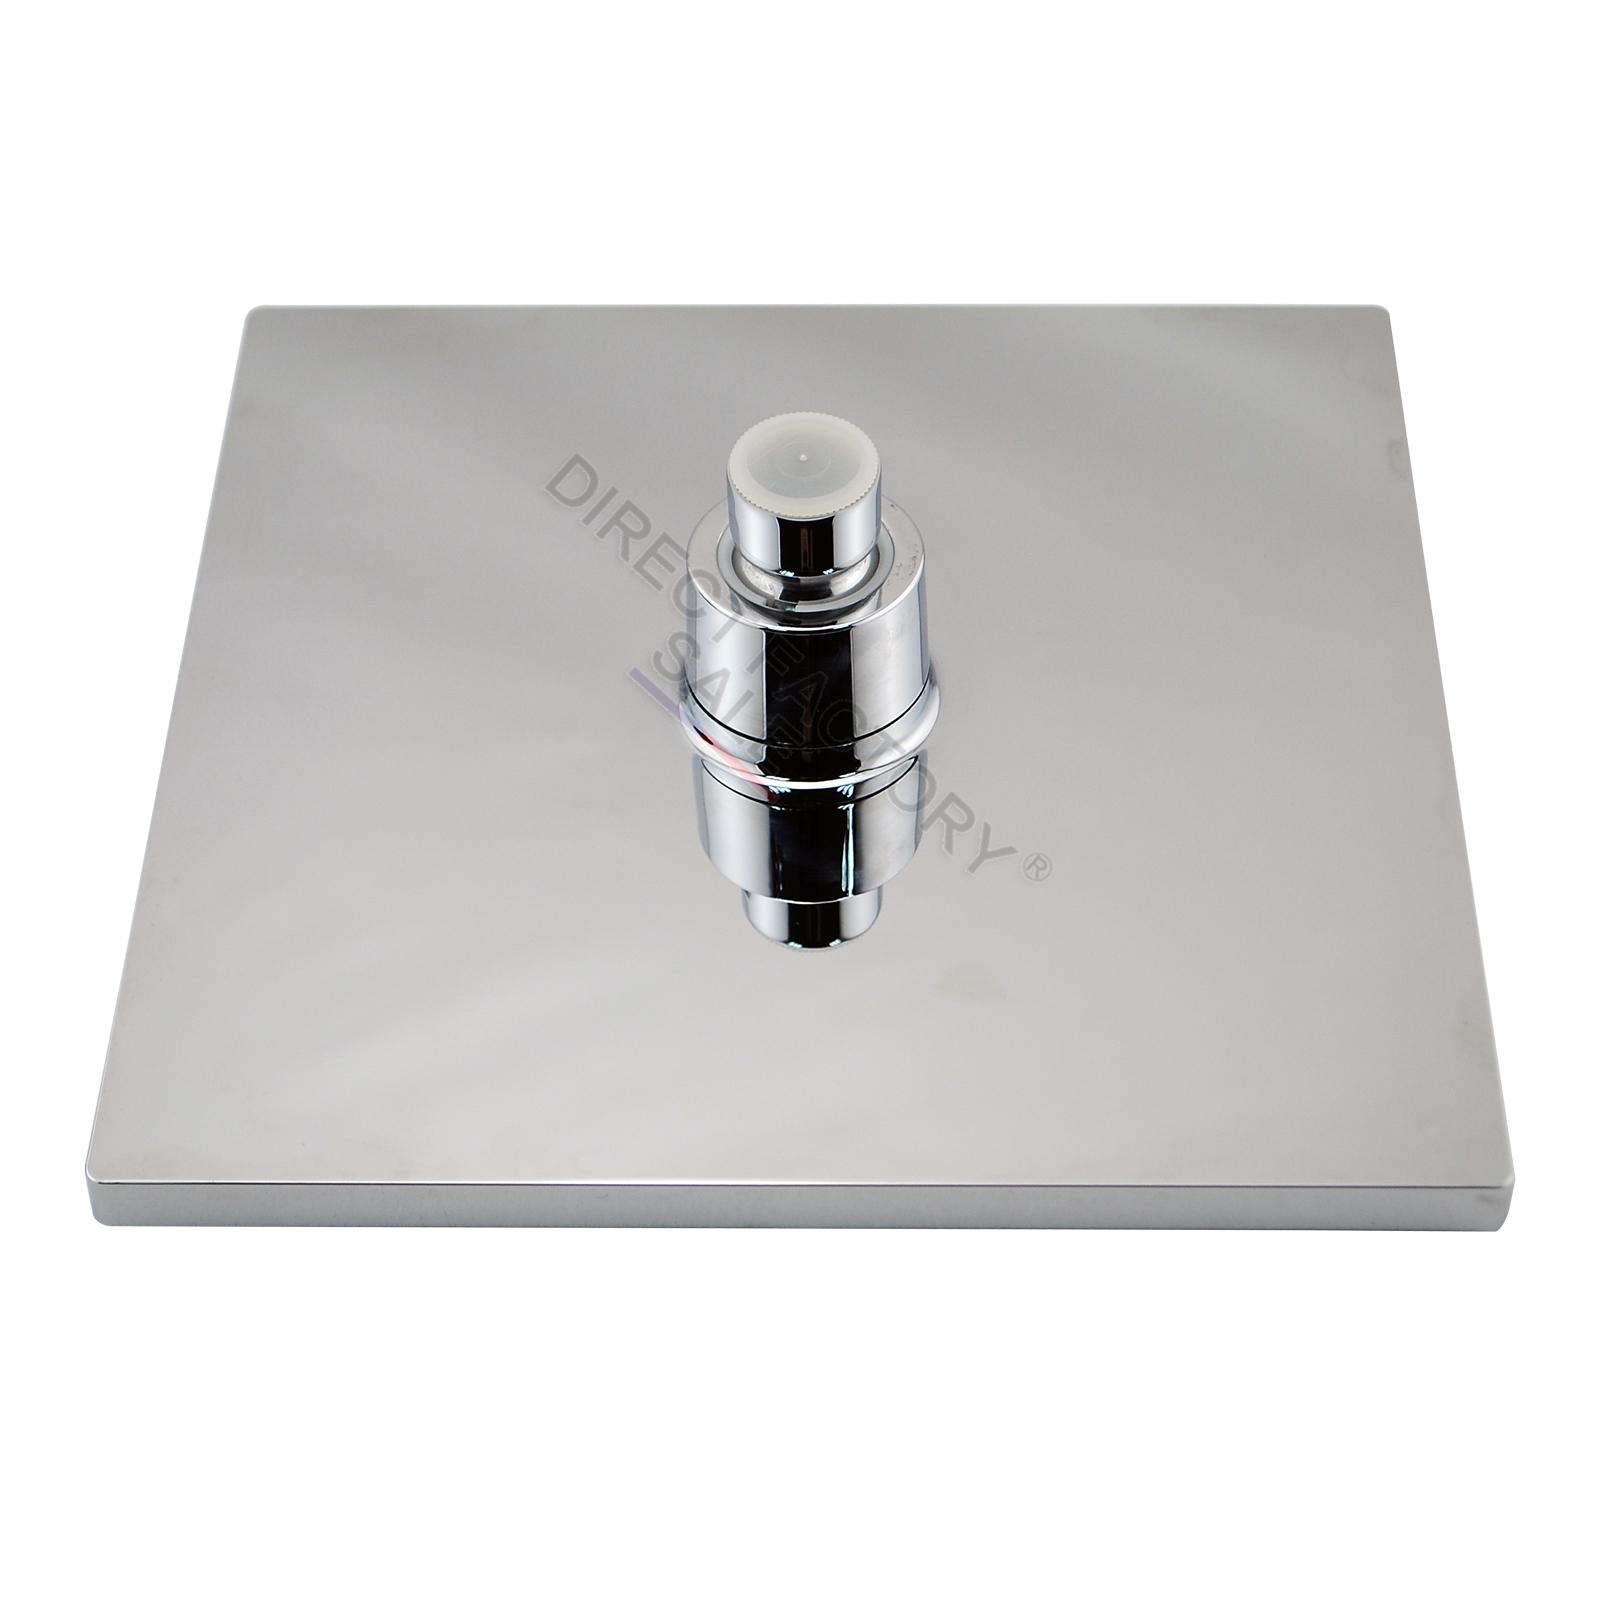 Rainfall Shower Head Set HandHeld Spray Diverter 1 4 Turn